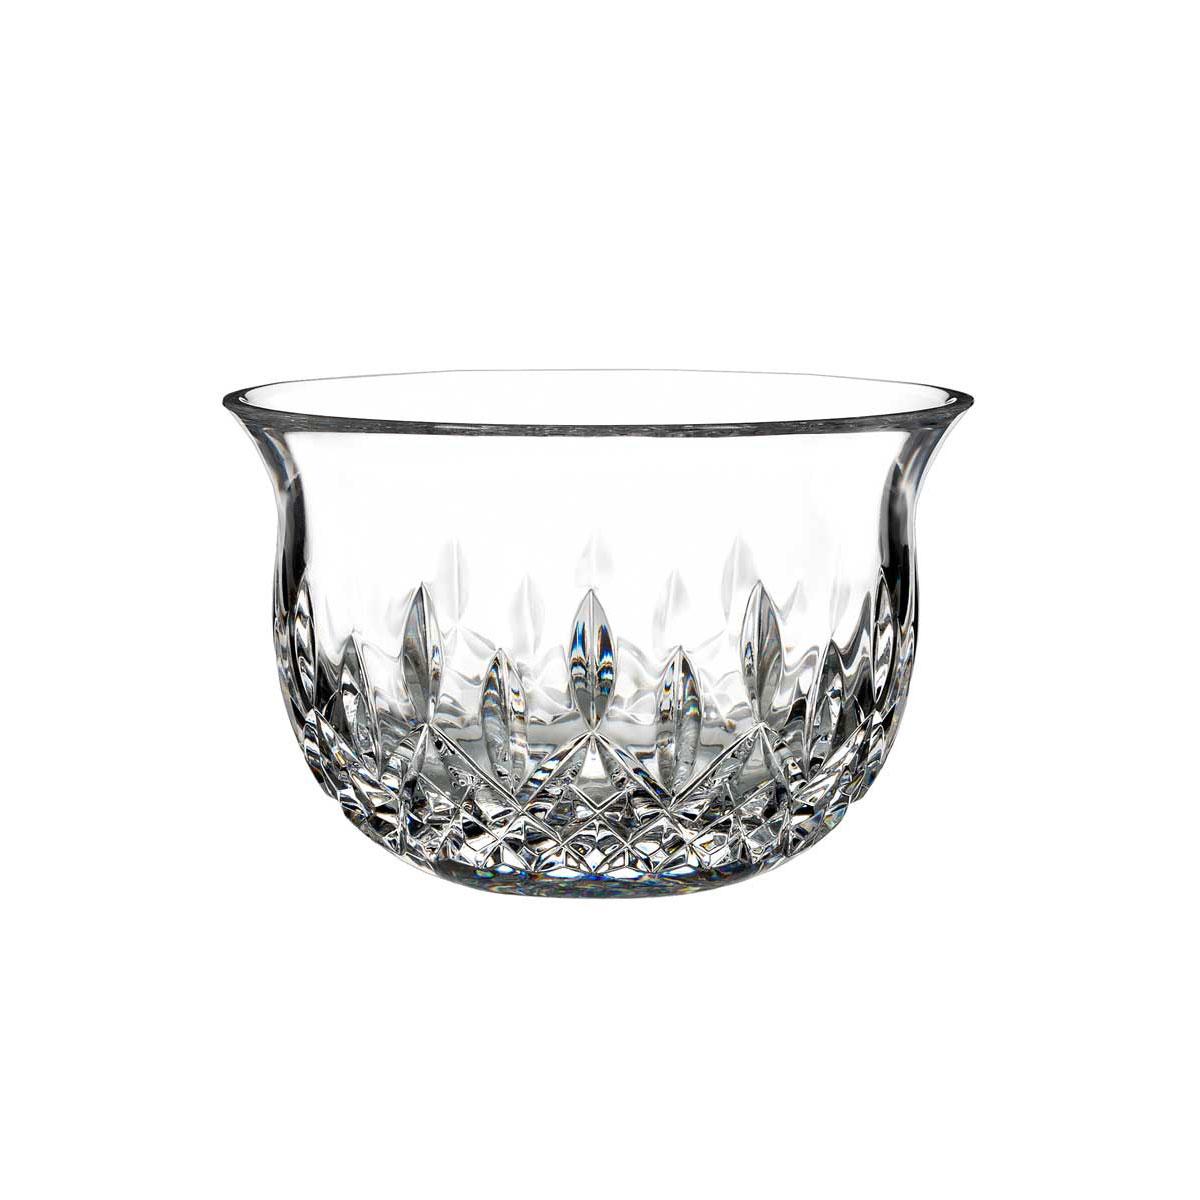 "Waterford Crystal, Giftology Lismore 5"" Sugar Crystal Bowl"